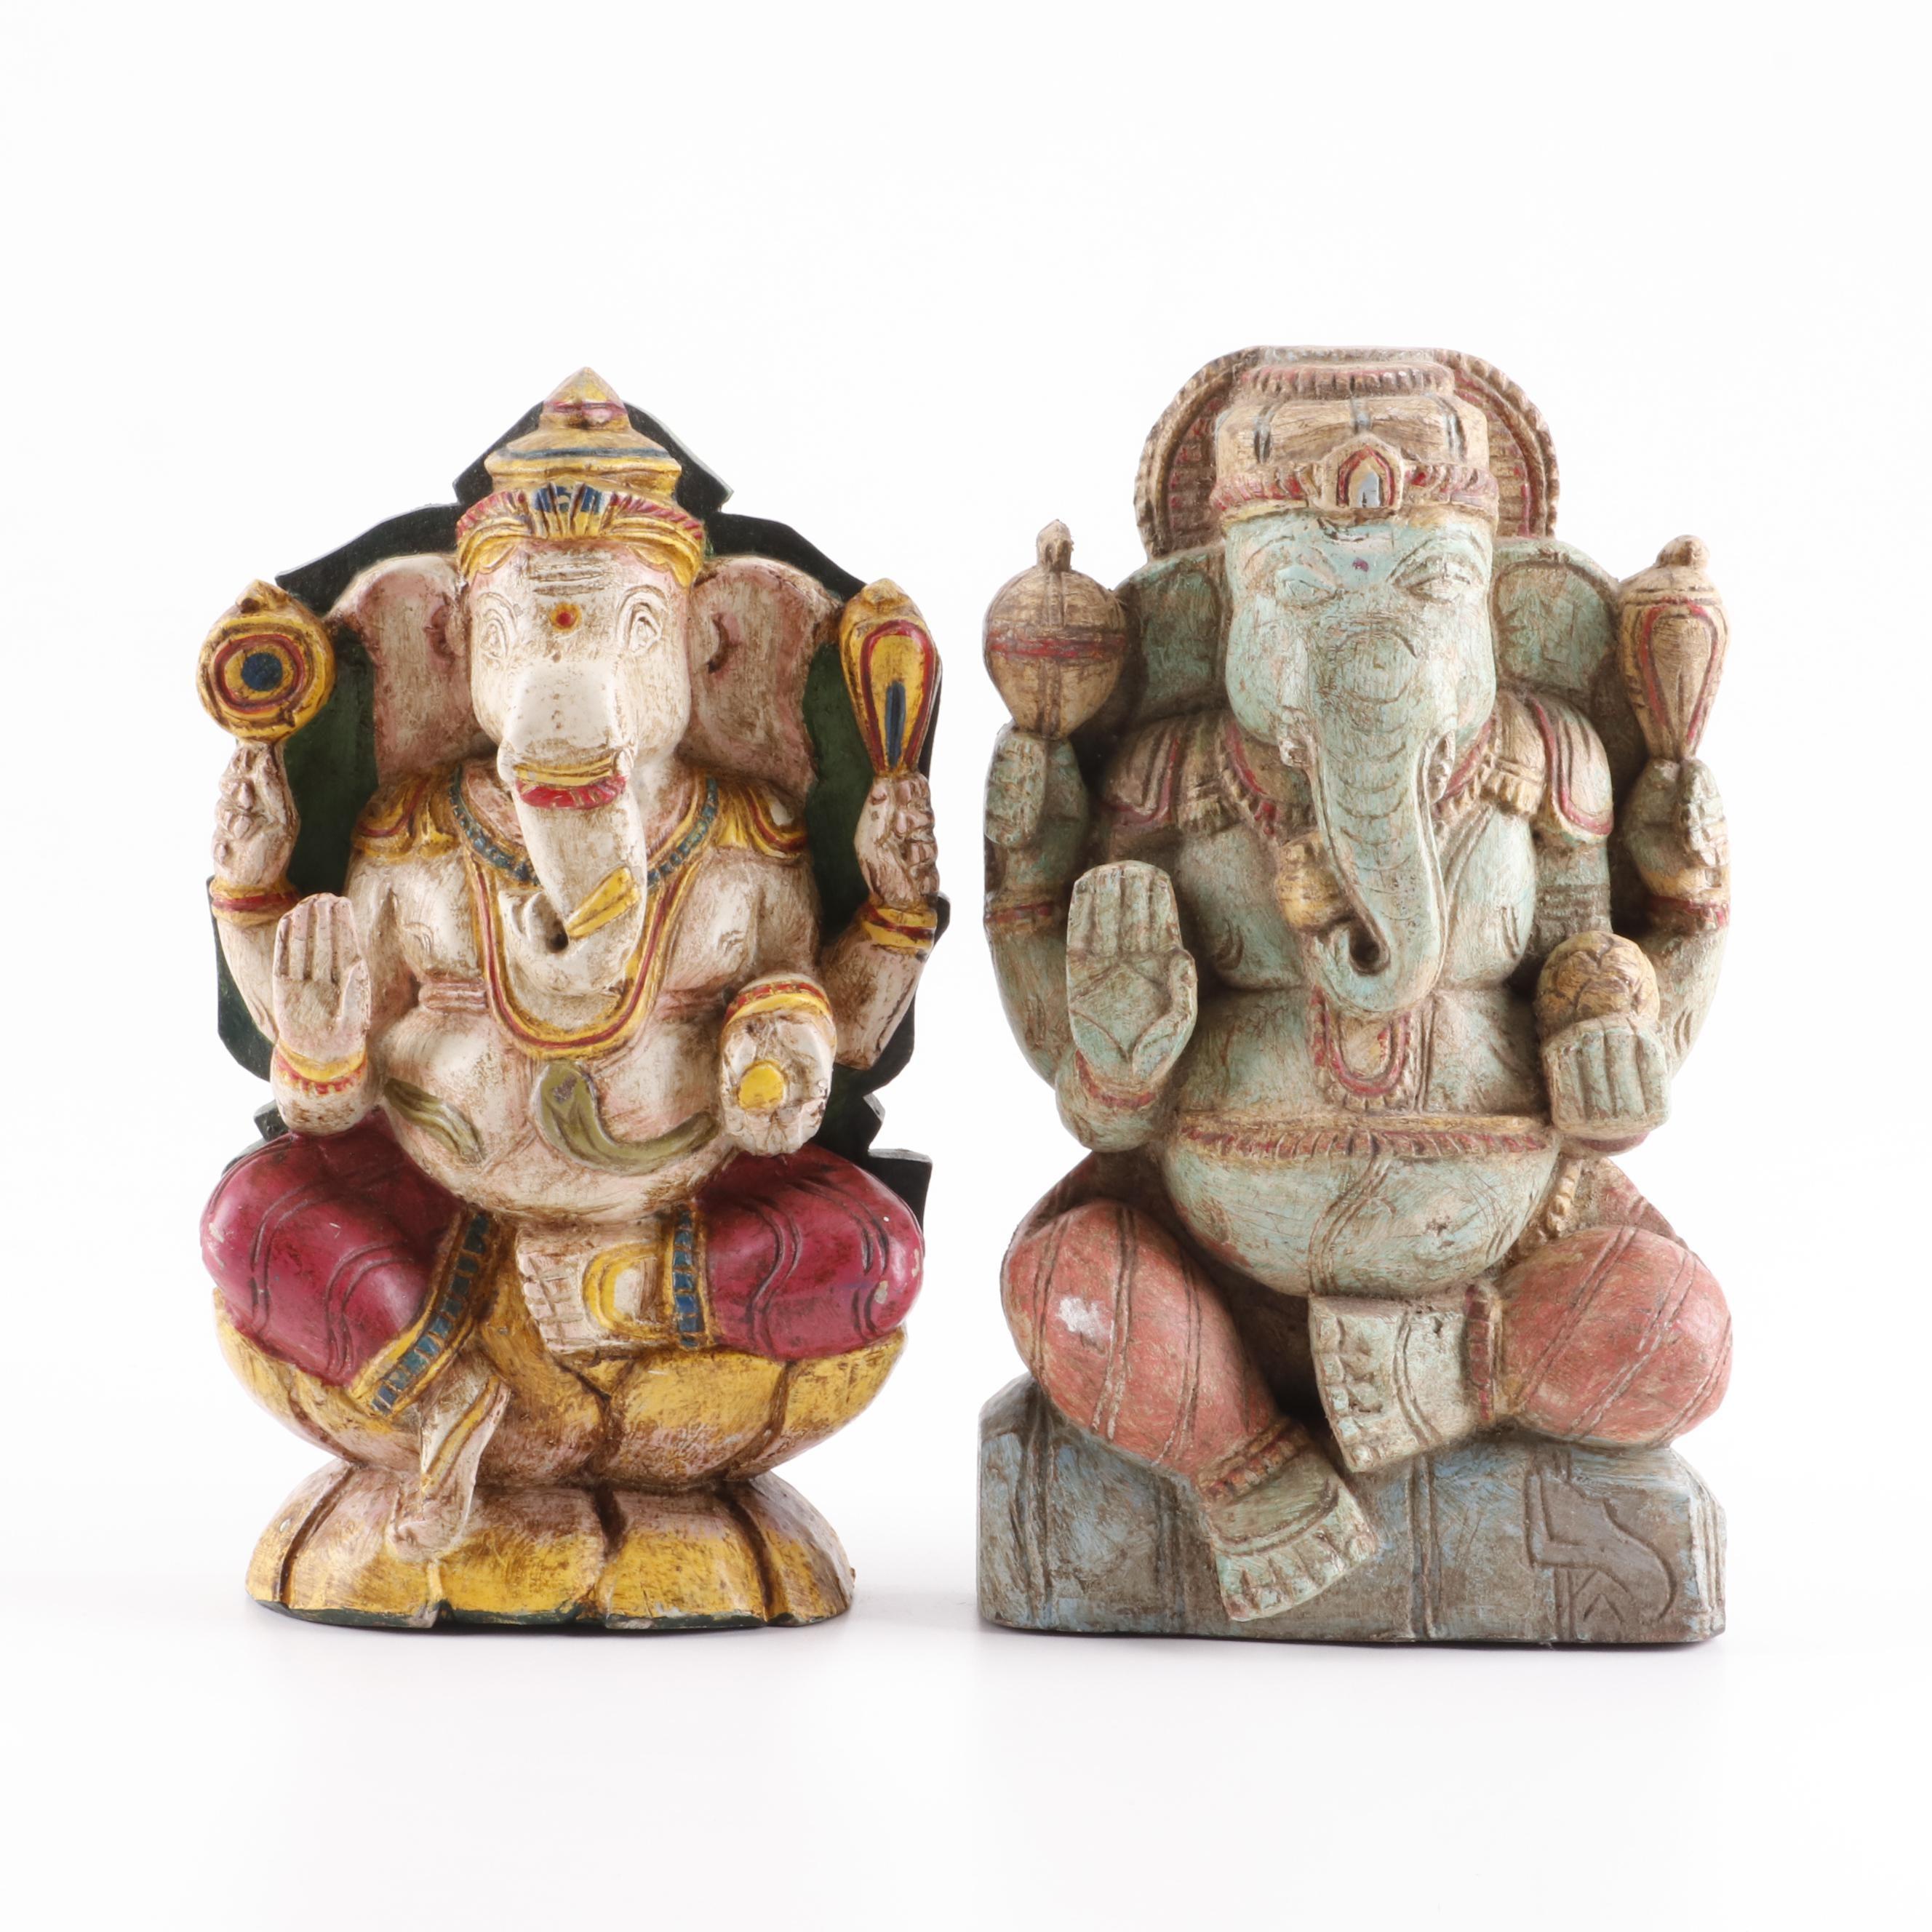 Polychrome Wood Sculptures of Ganesha